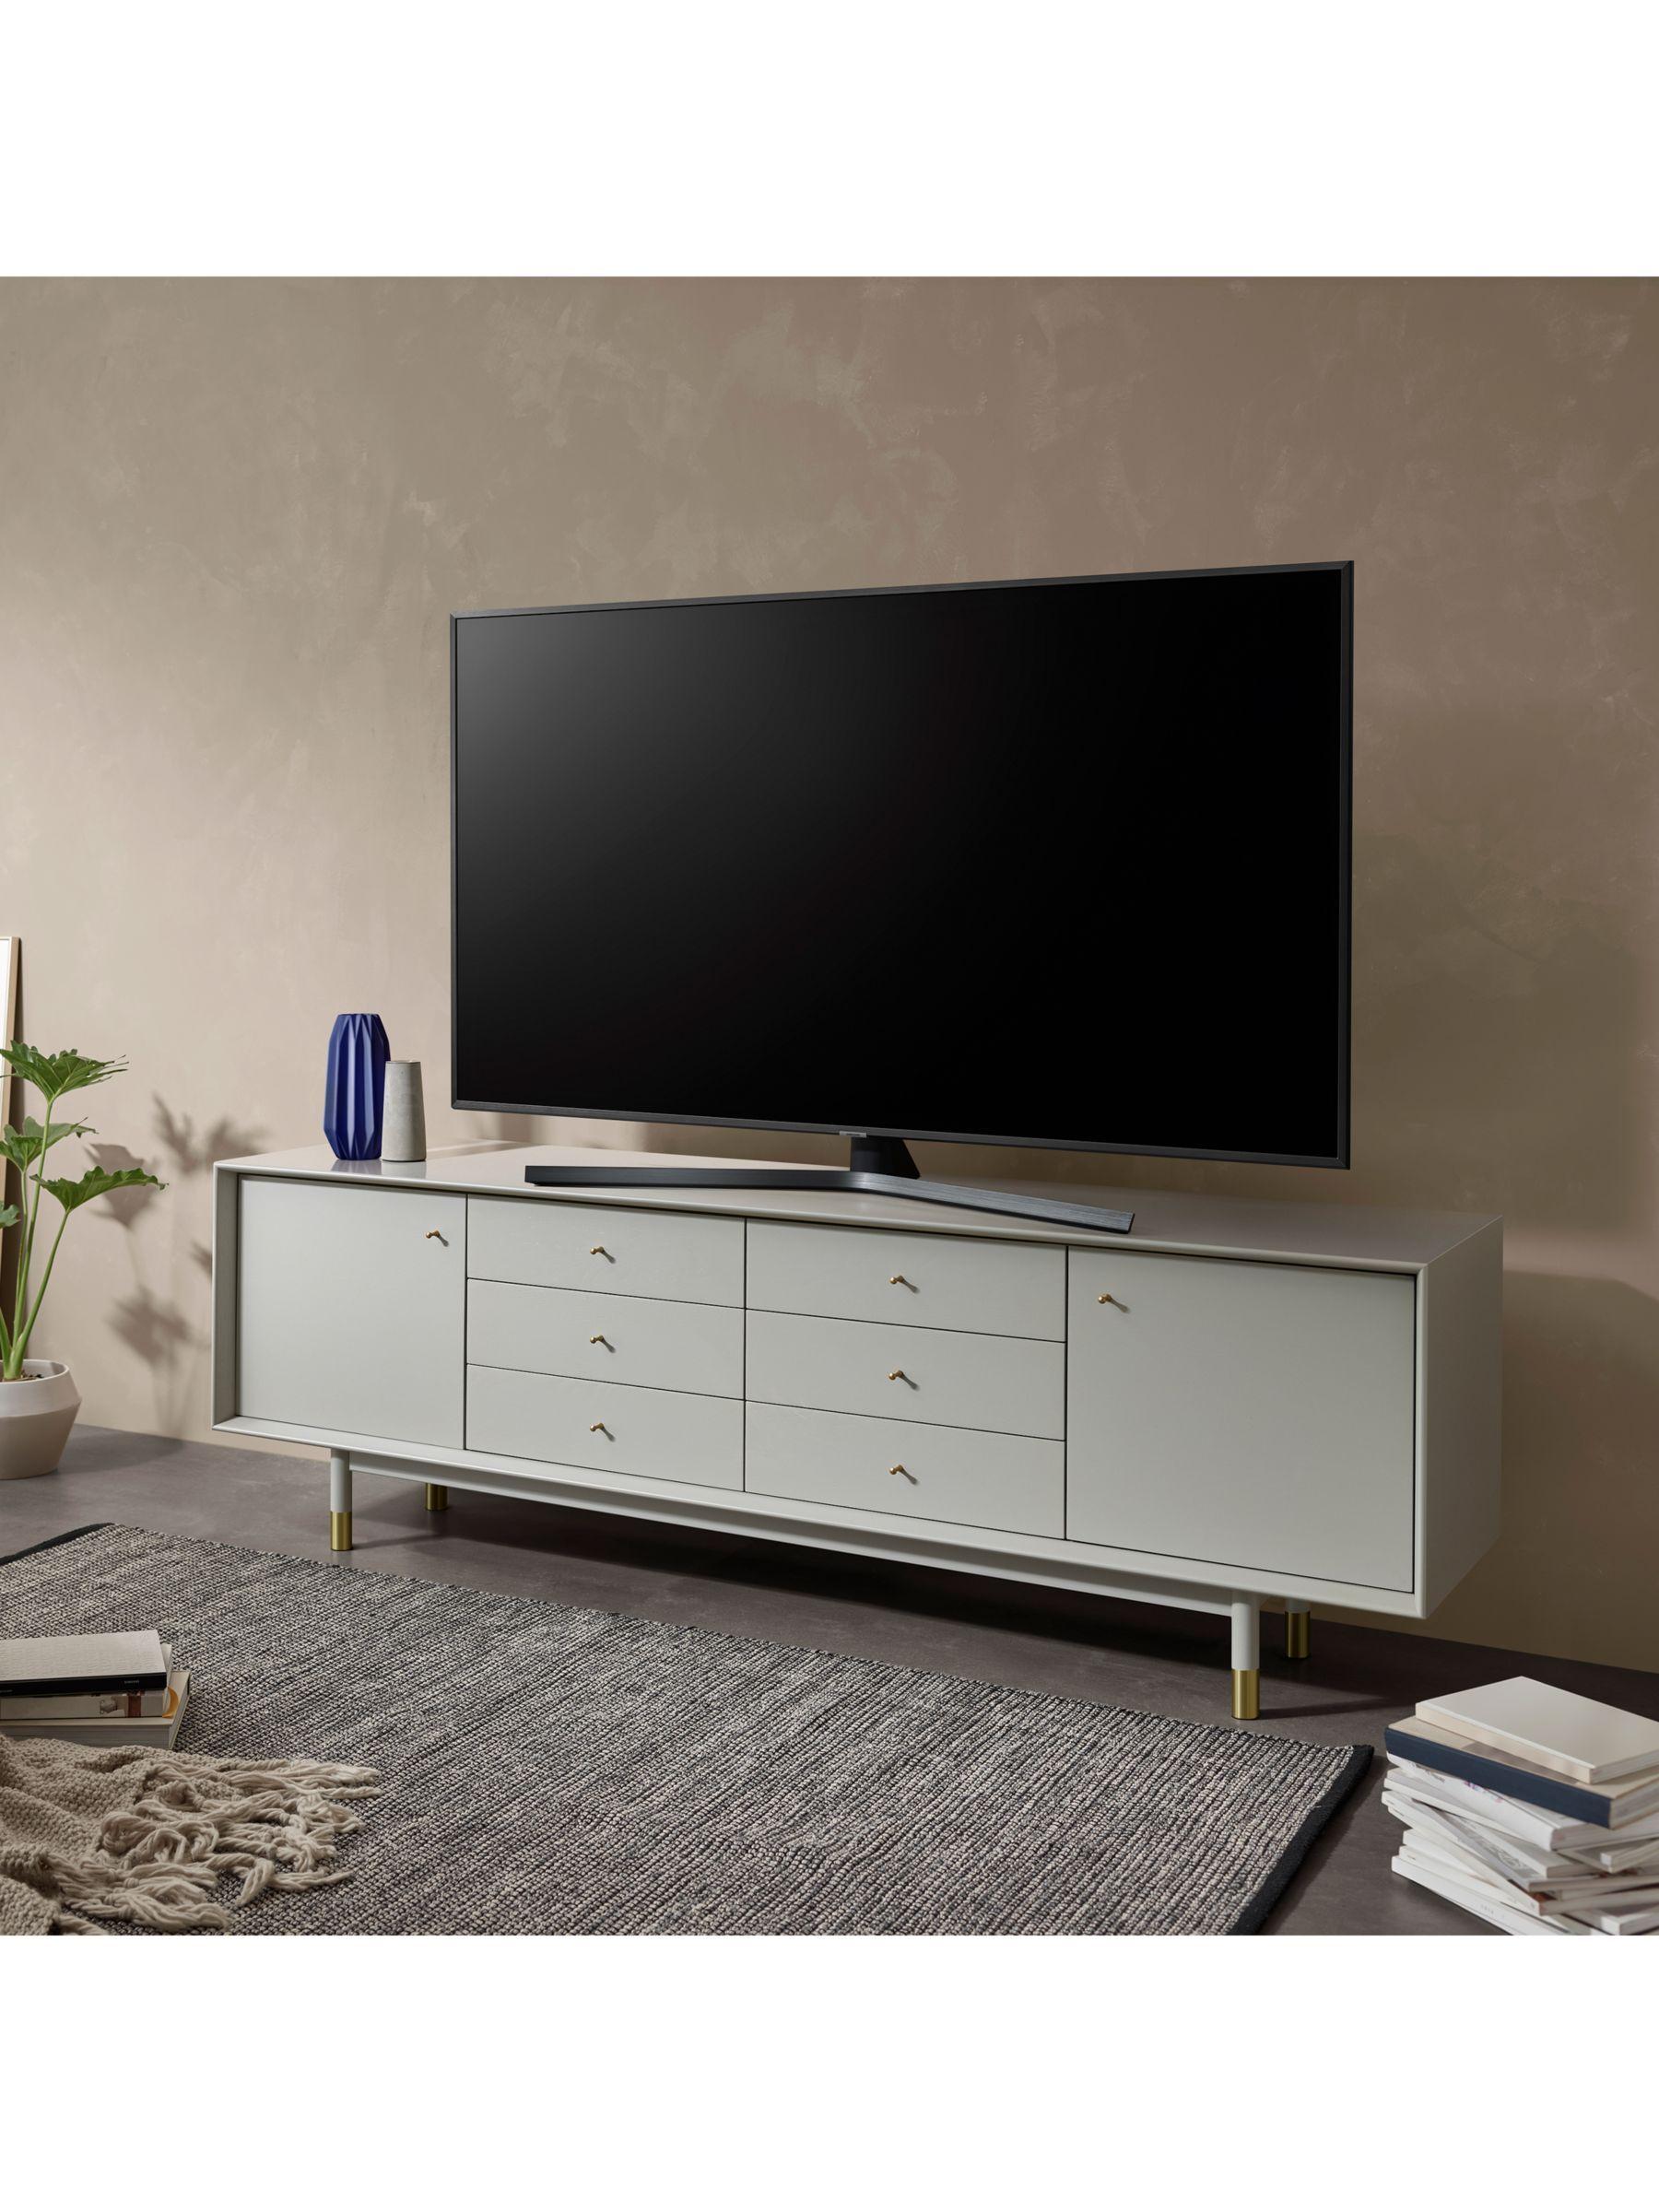 Samsung Ue55ru7400 2019 Hdr 4k Ultra Hd Smart Tv 55 With